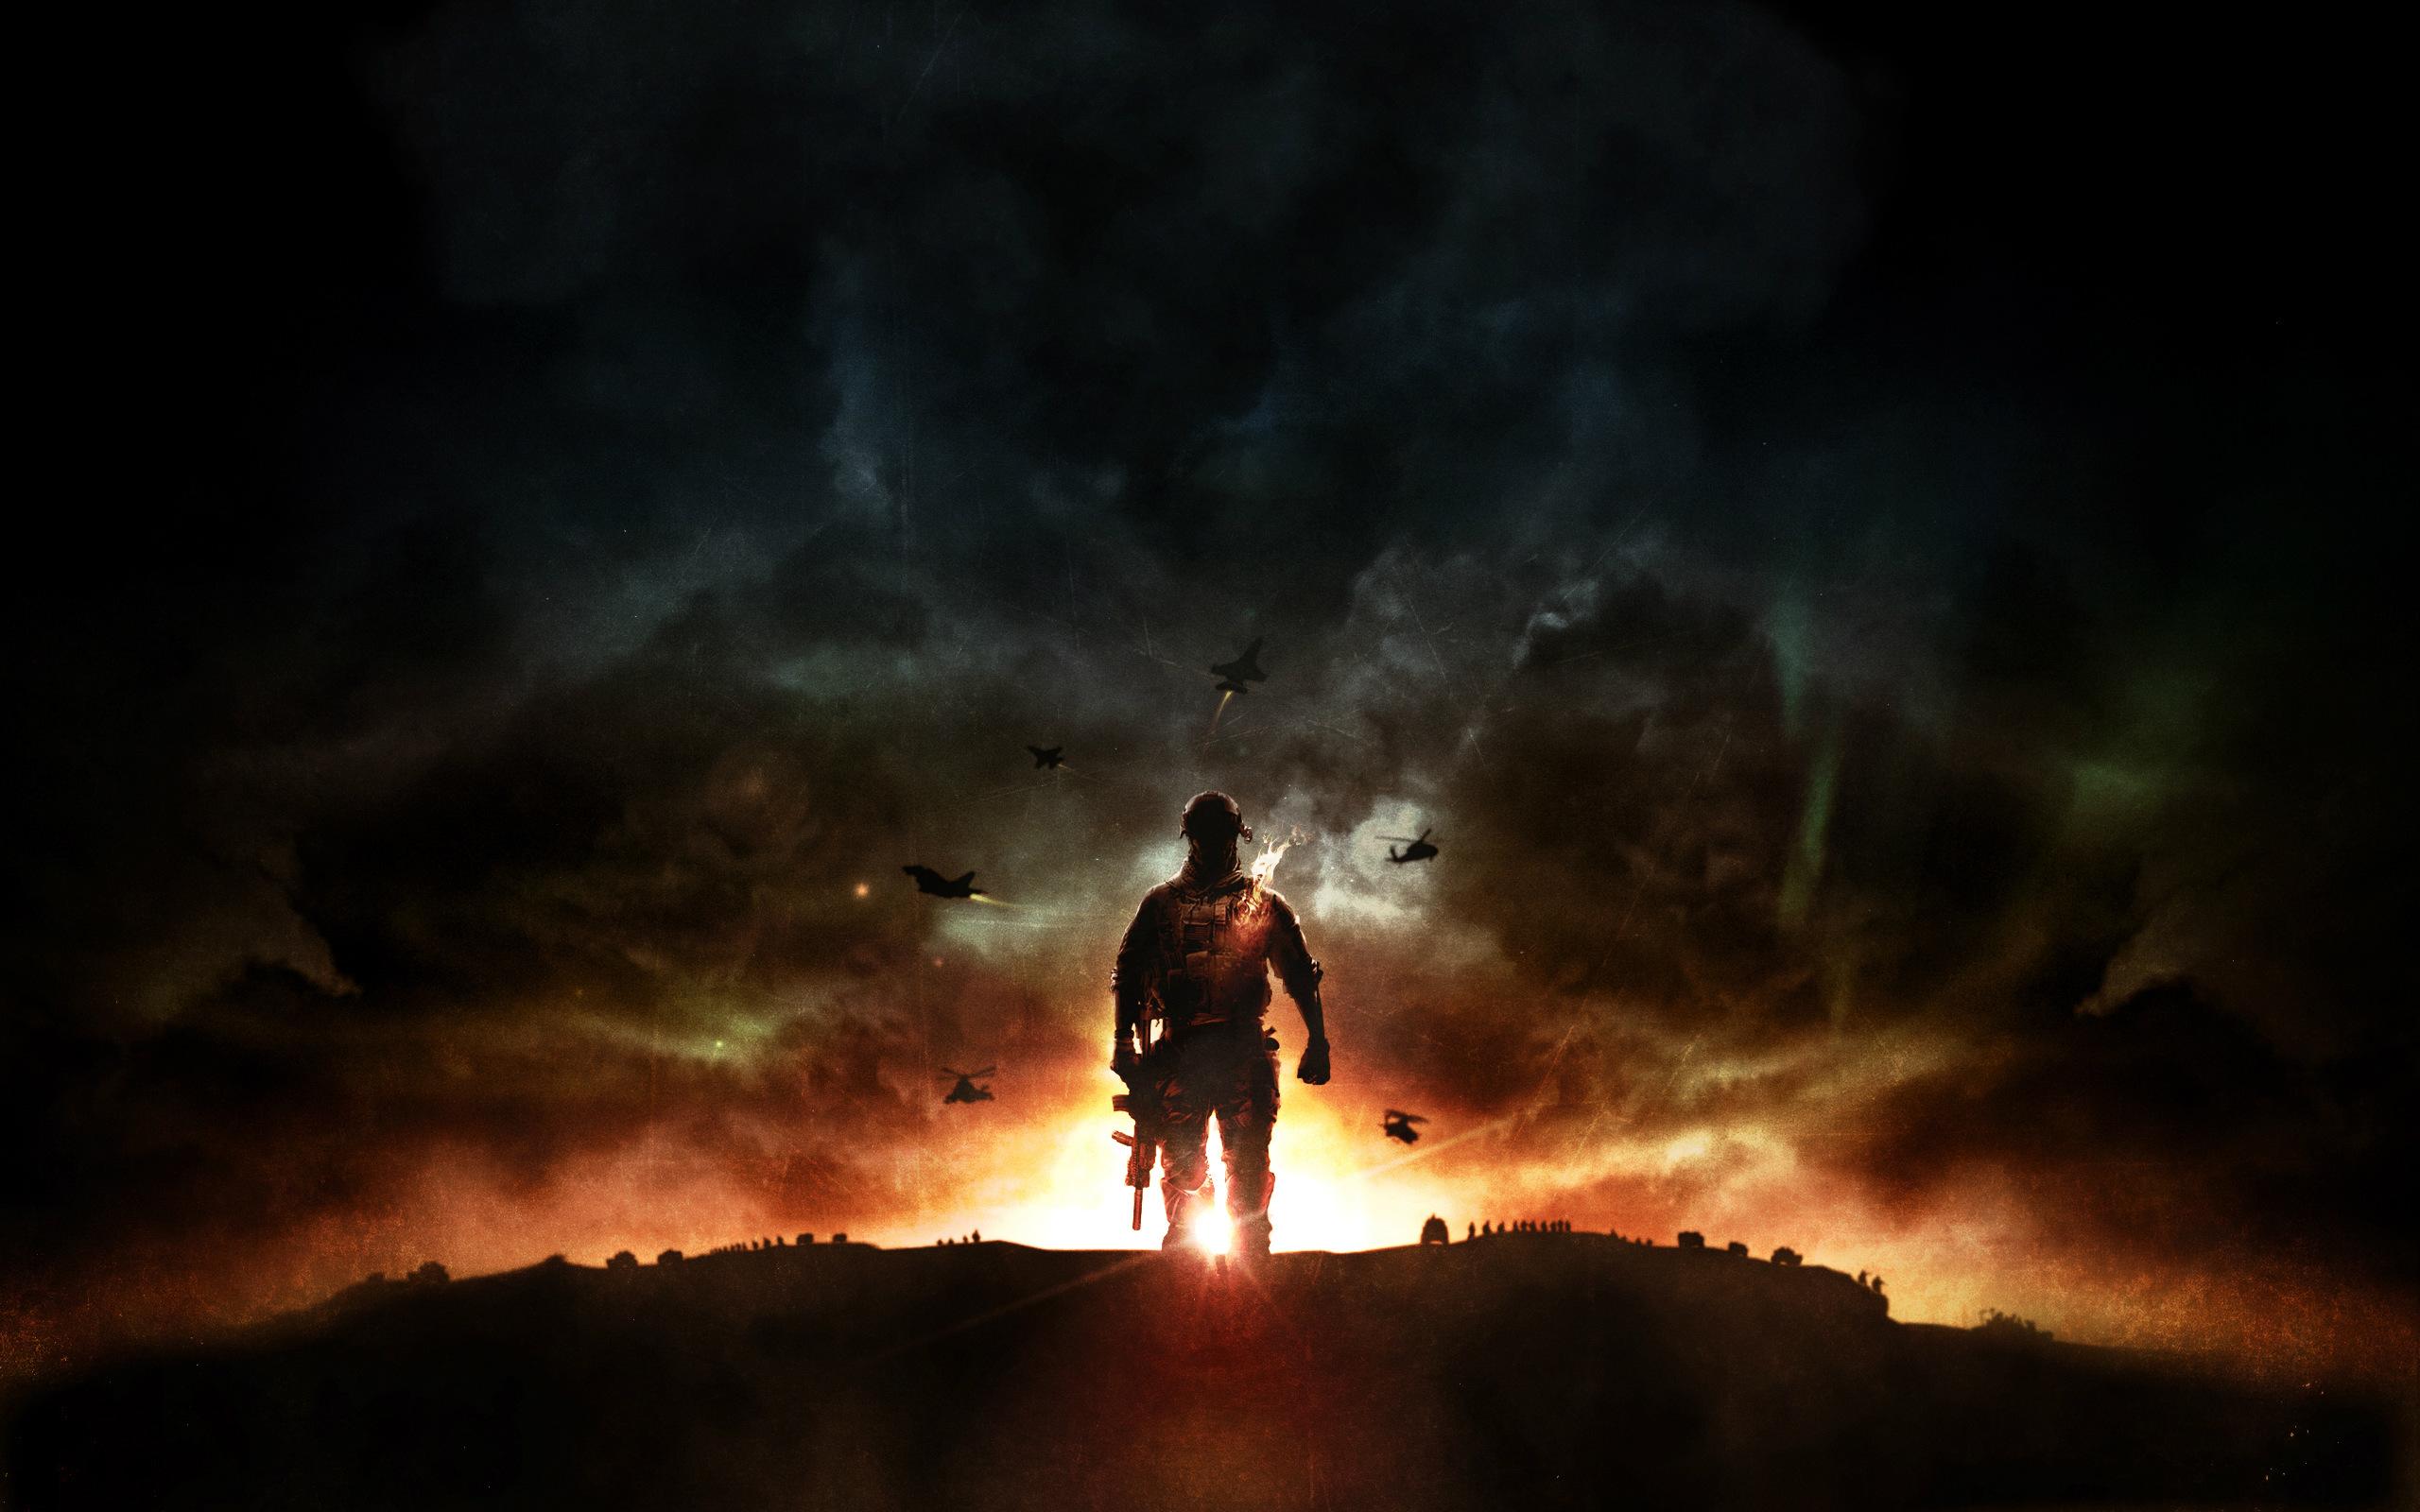 2560x1600 Battlefield 4 Game Explosion 2560x1600